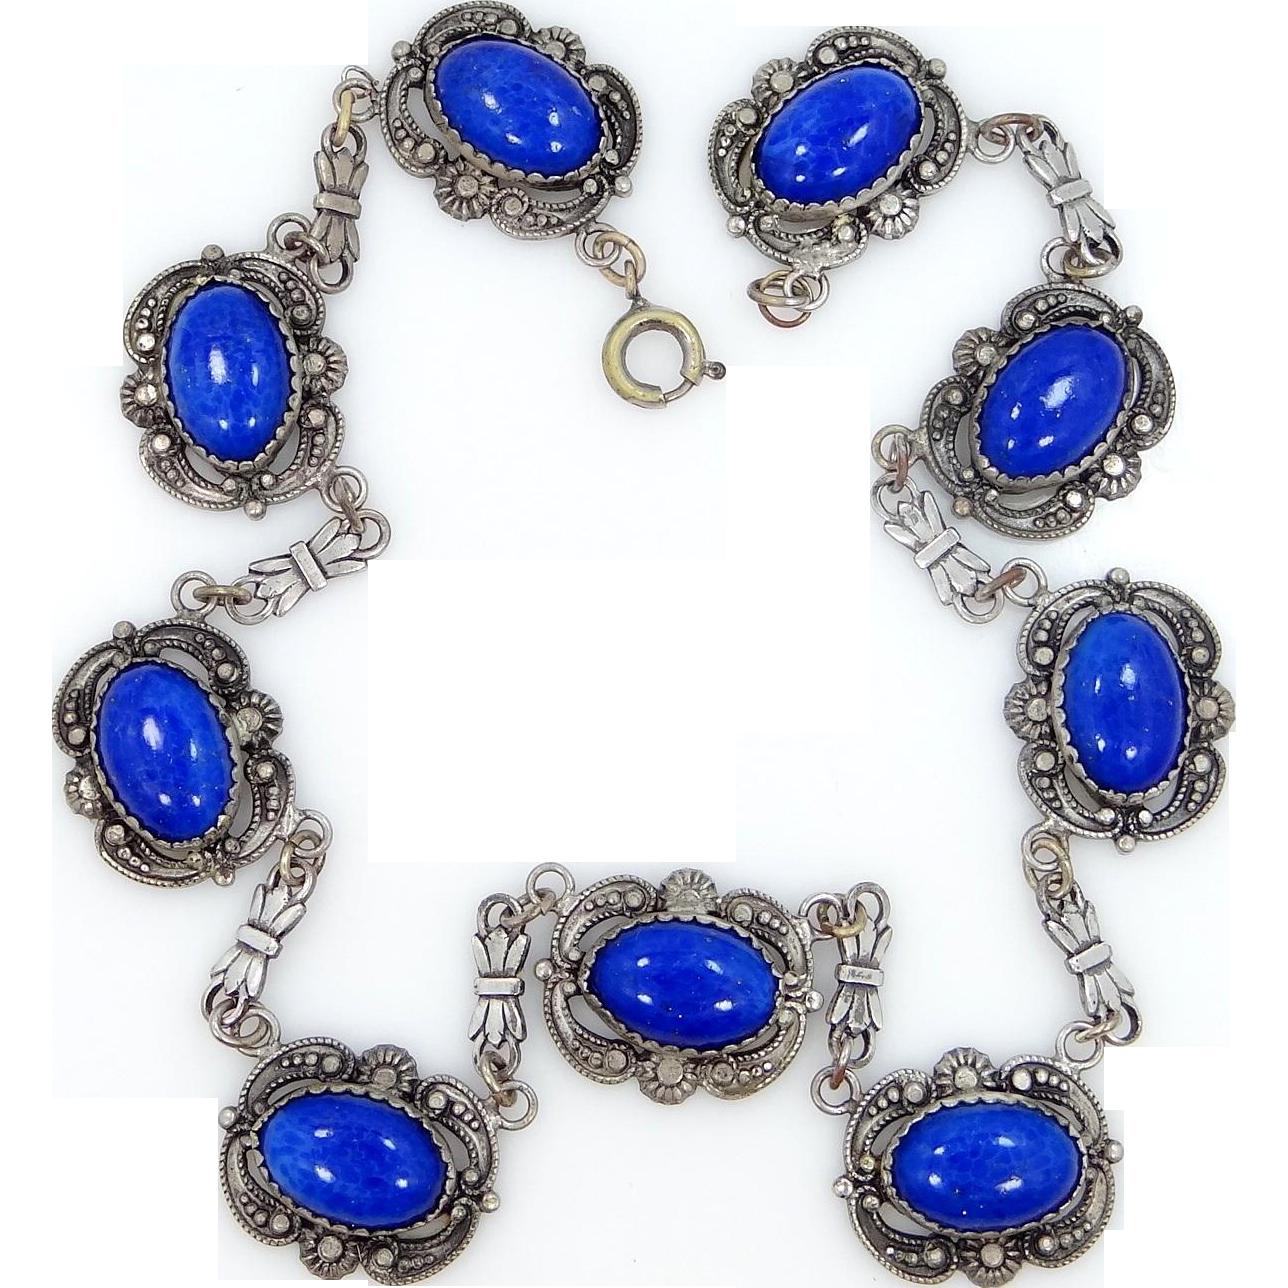 1920s Lapis Blue Glass Art Deco Necklace Czechoslovakia